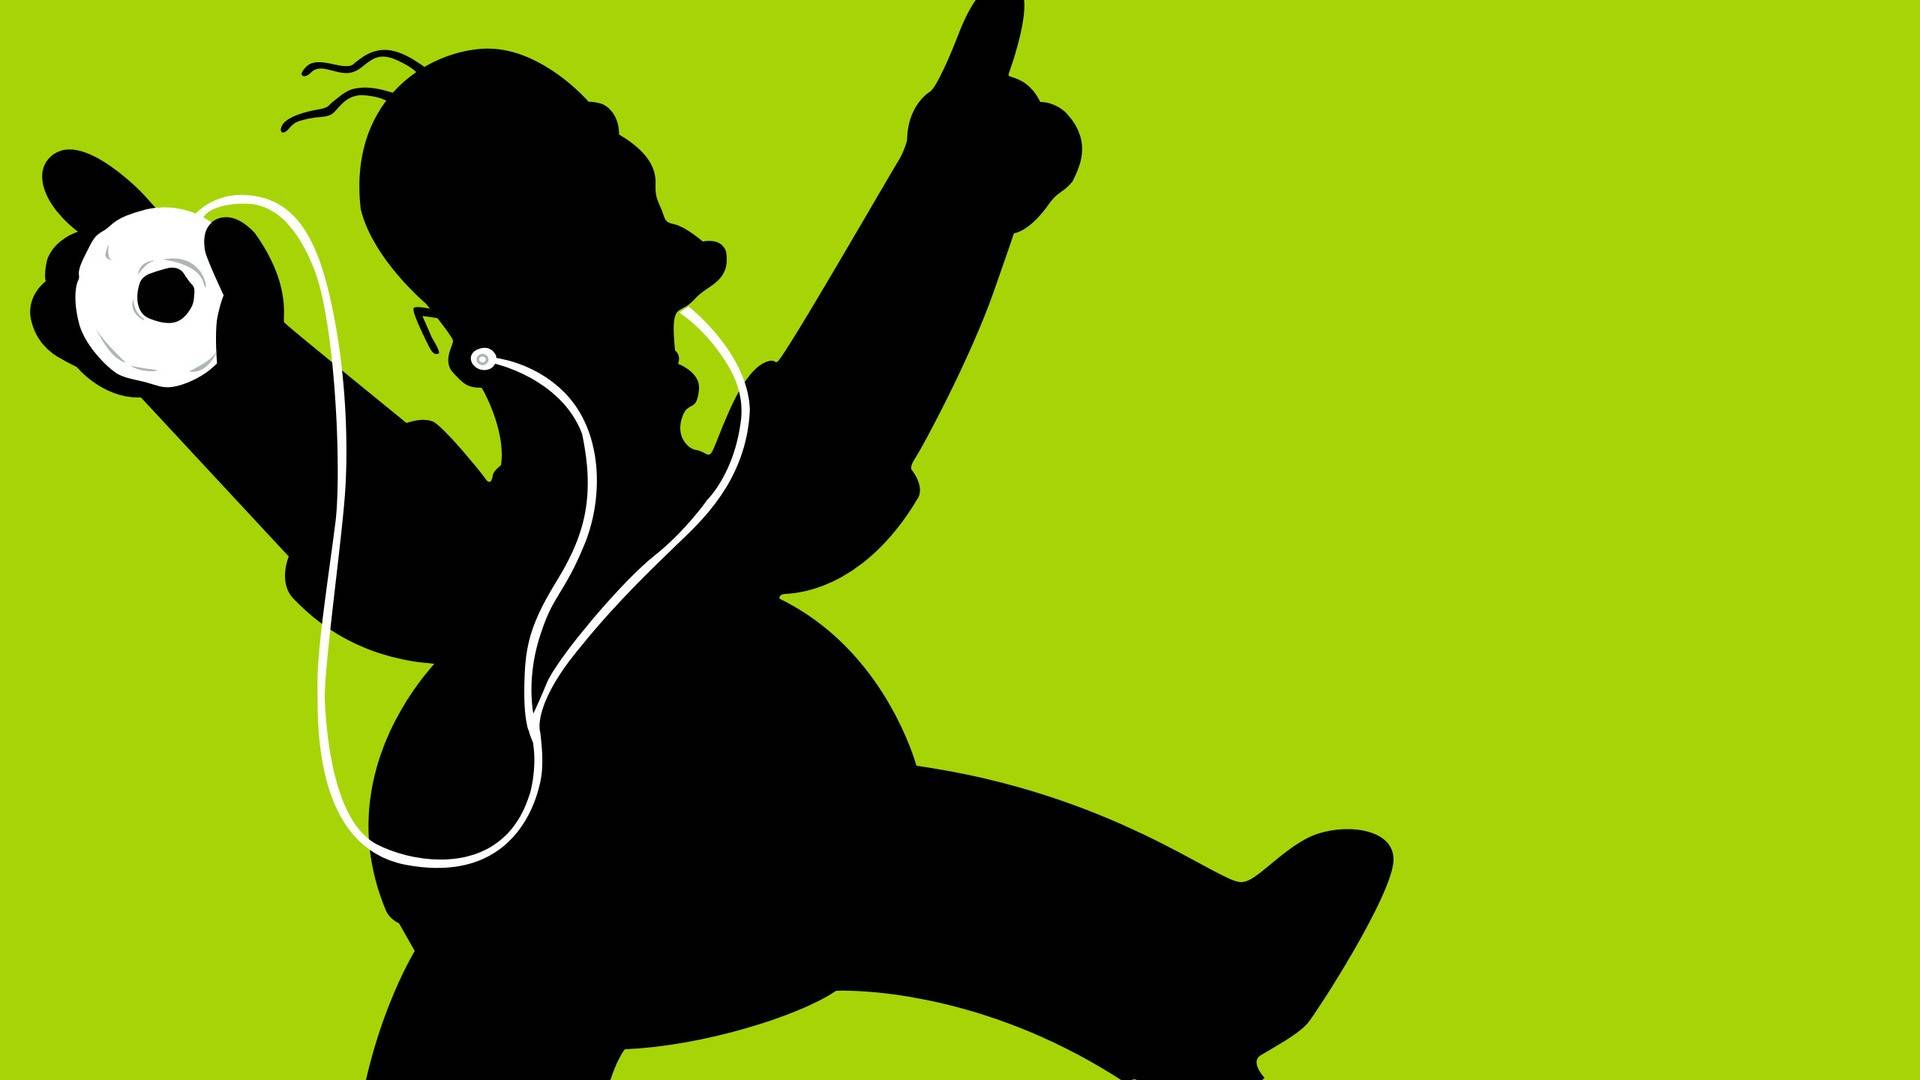 Music Ipod 19201080 Wallpaper 1704335 1920x1080